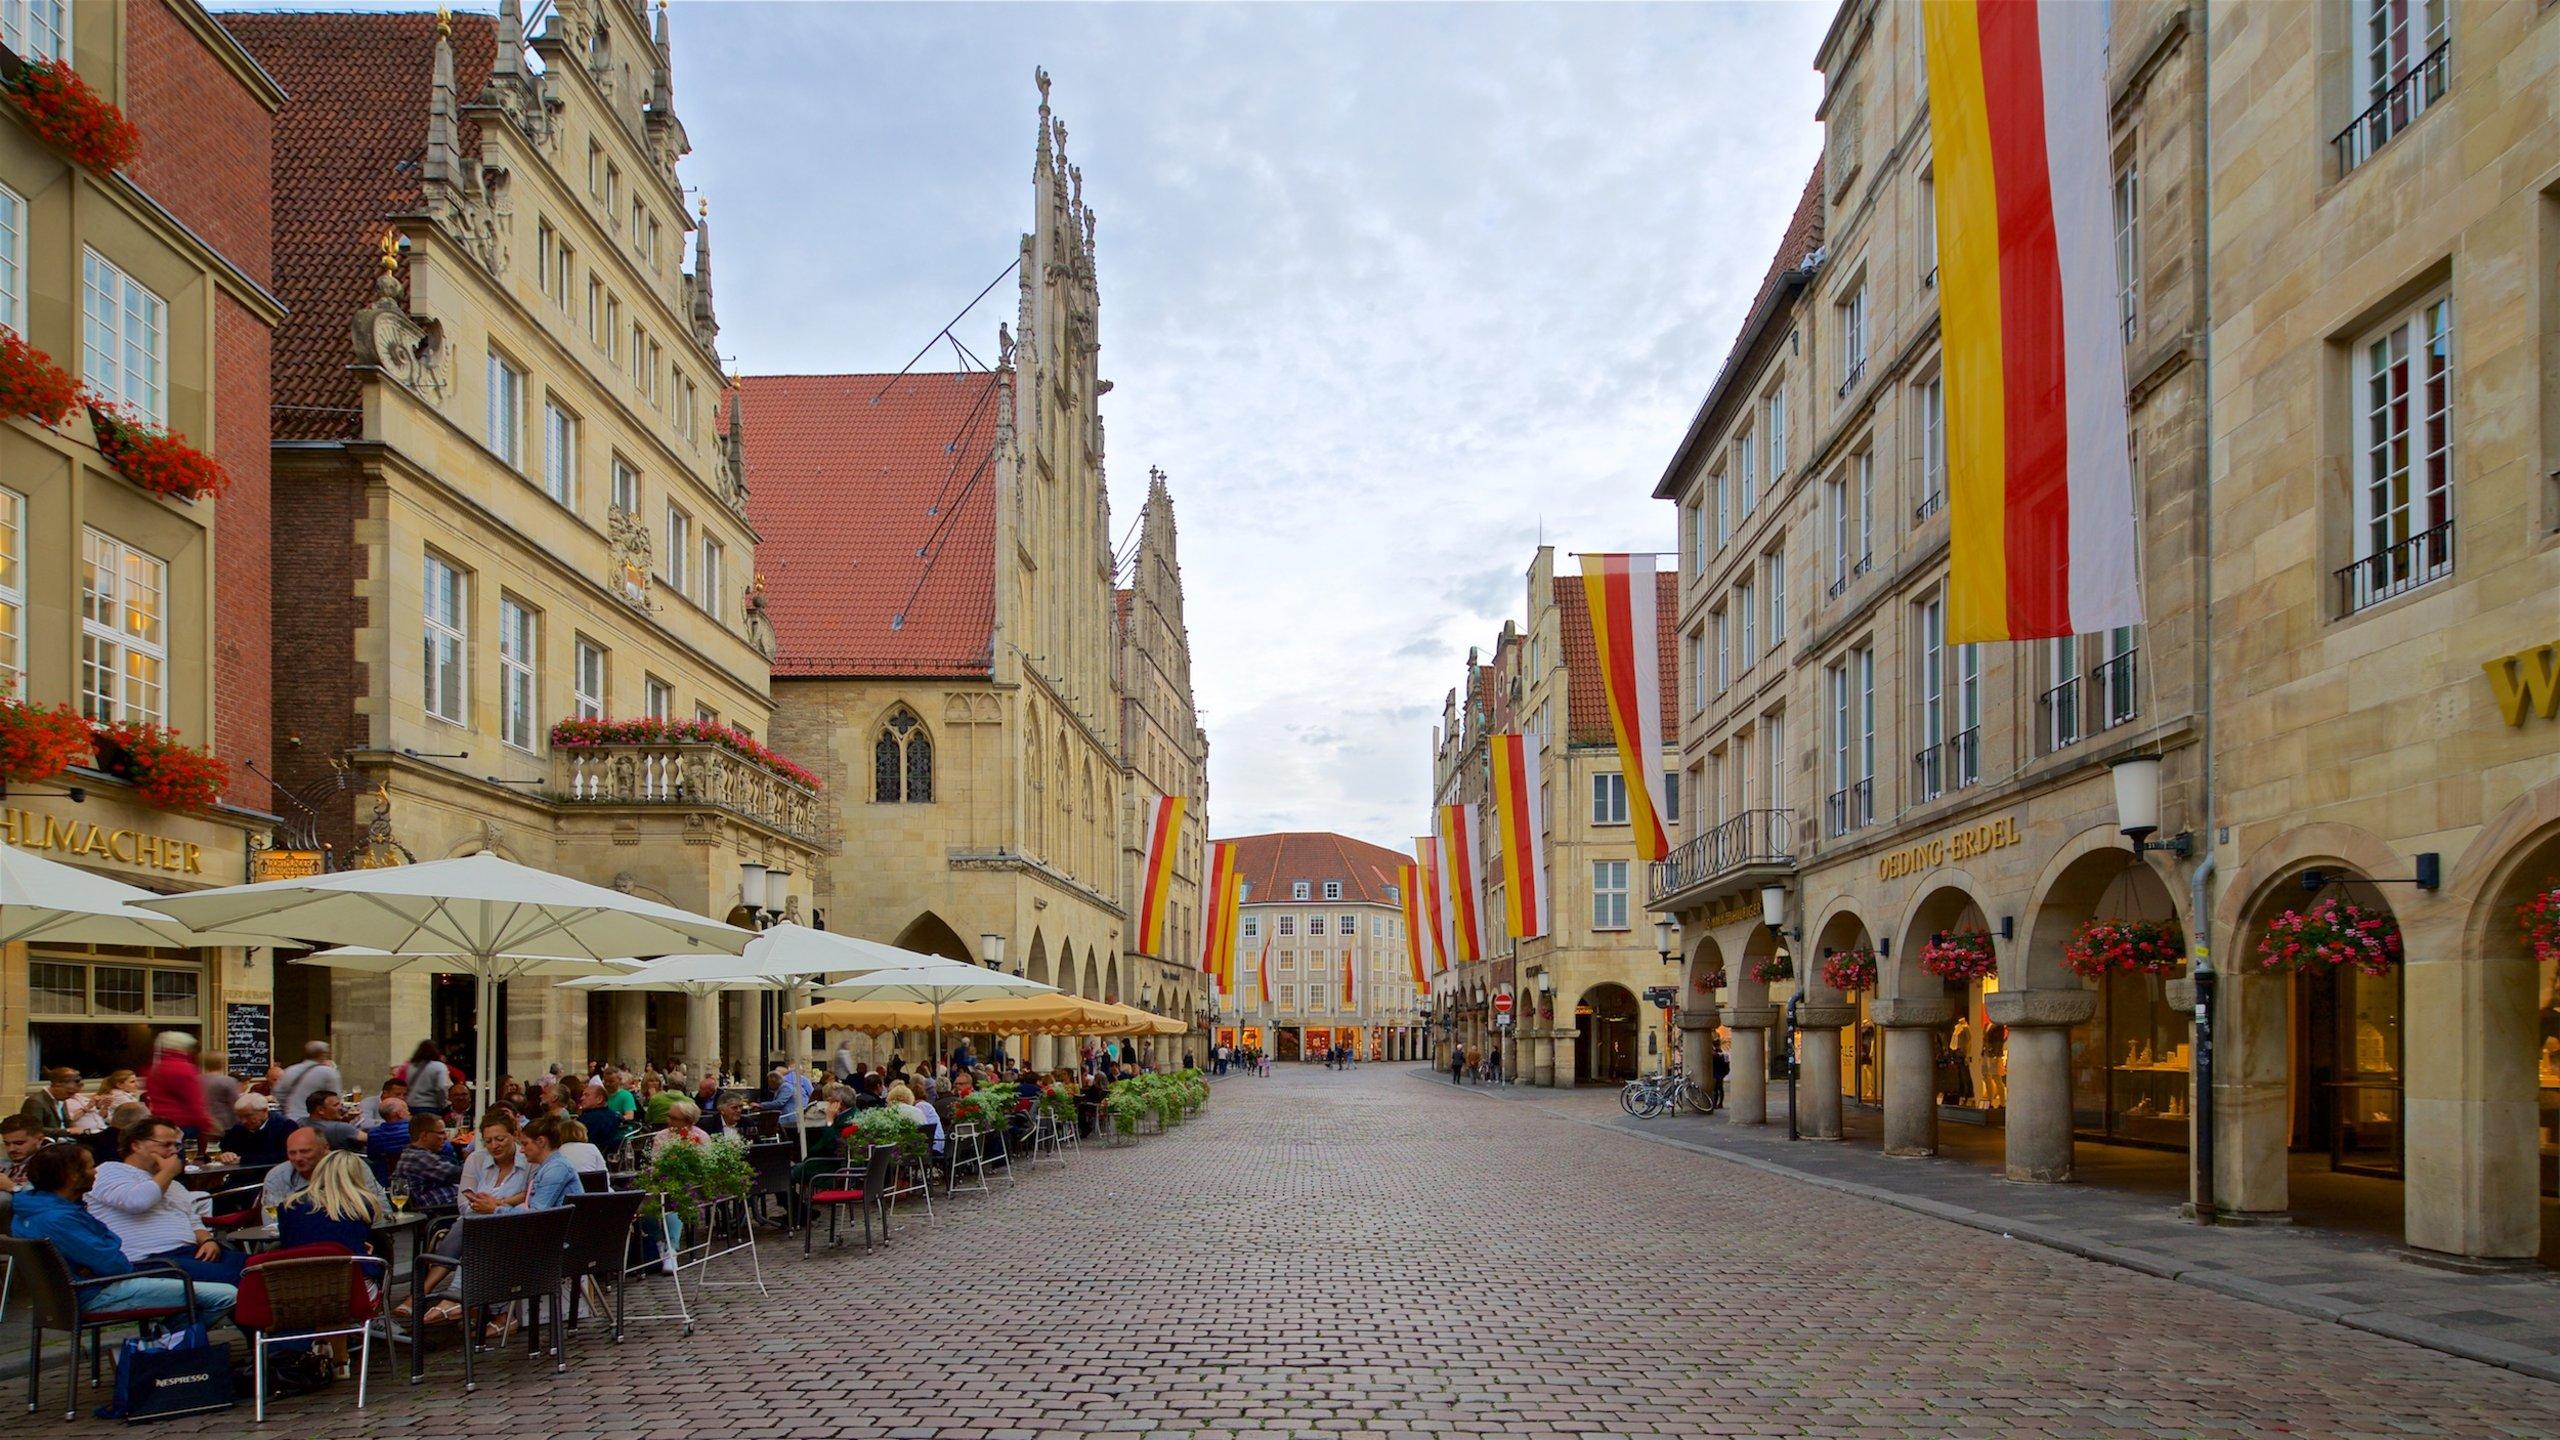 Münster, Münster, North Rhine-Westphalia, Germany